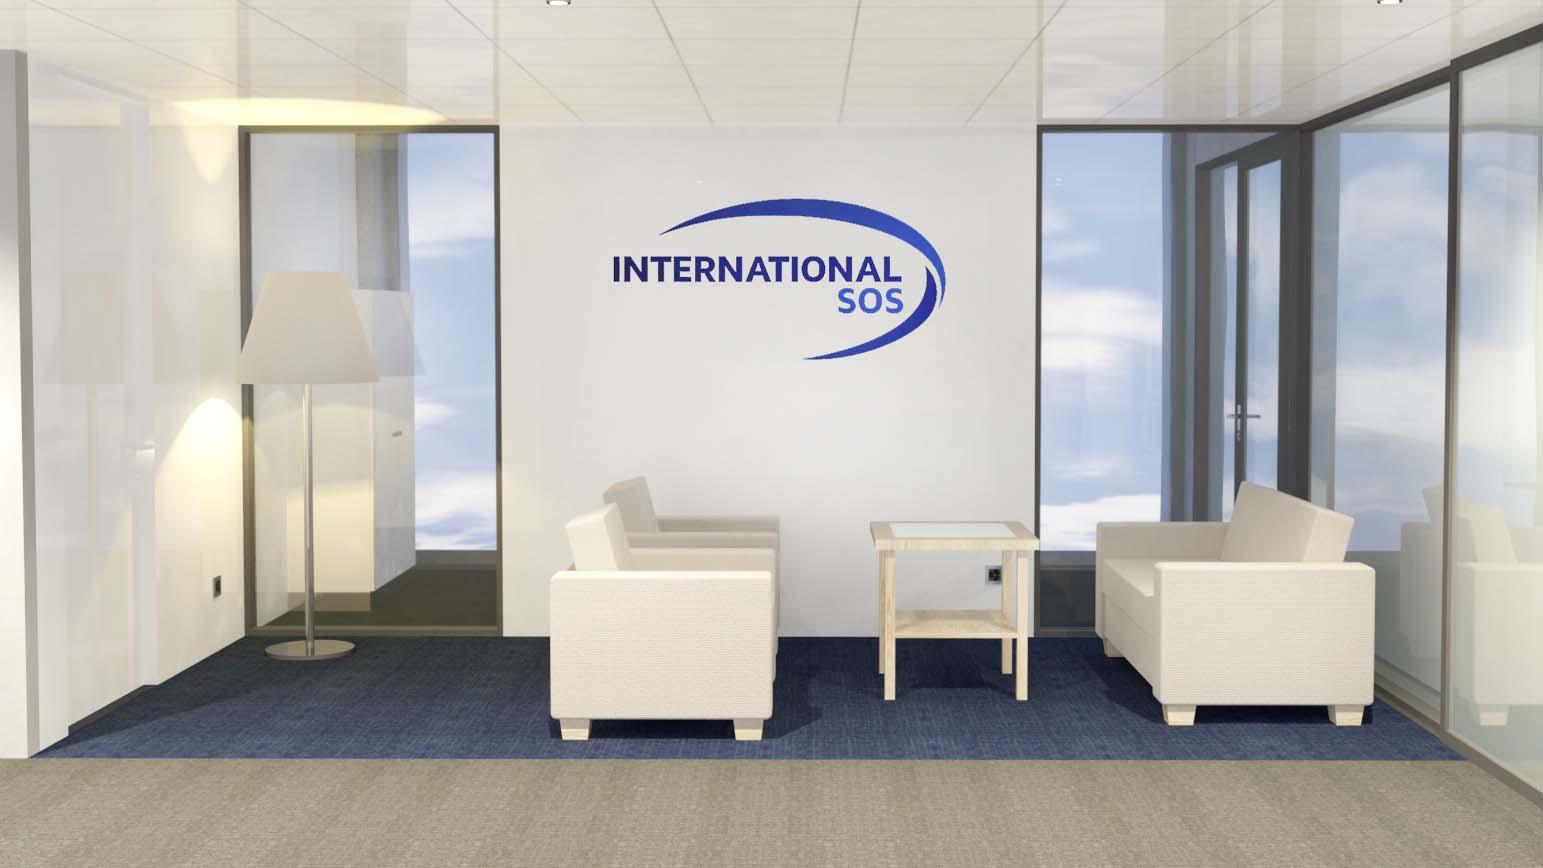 International SOS Space planning